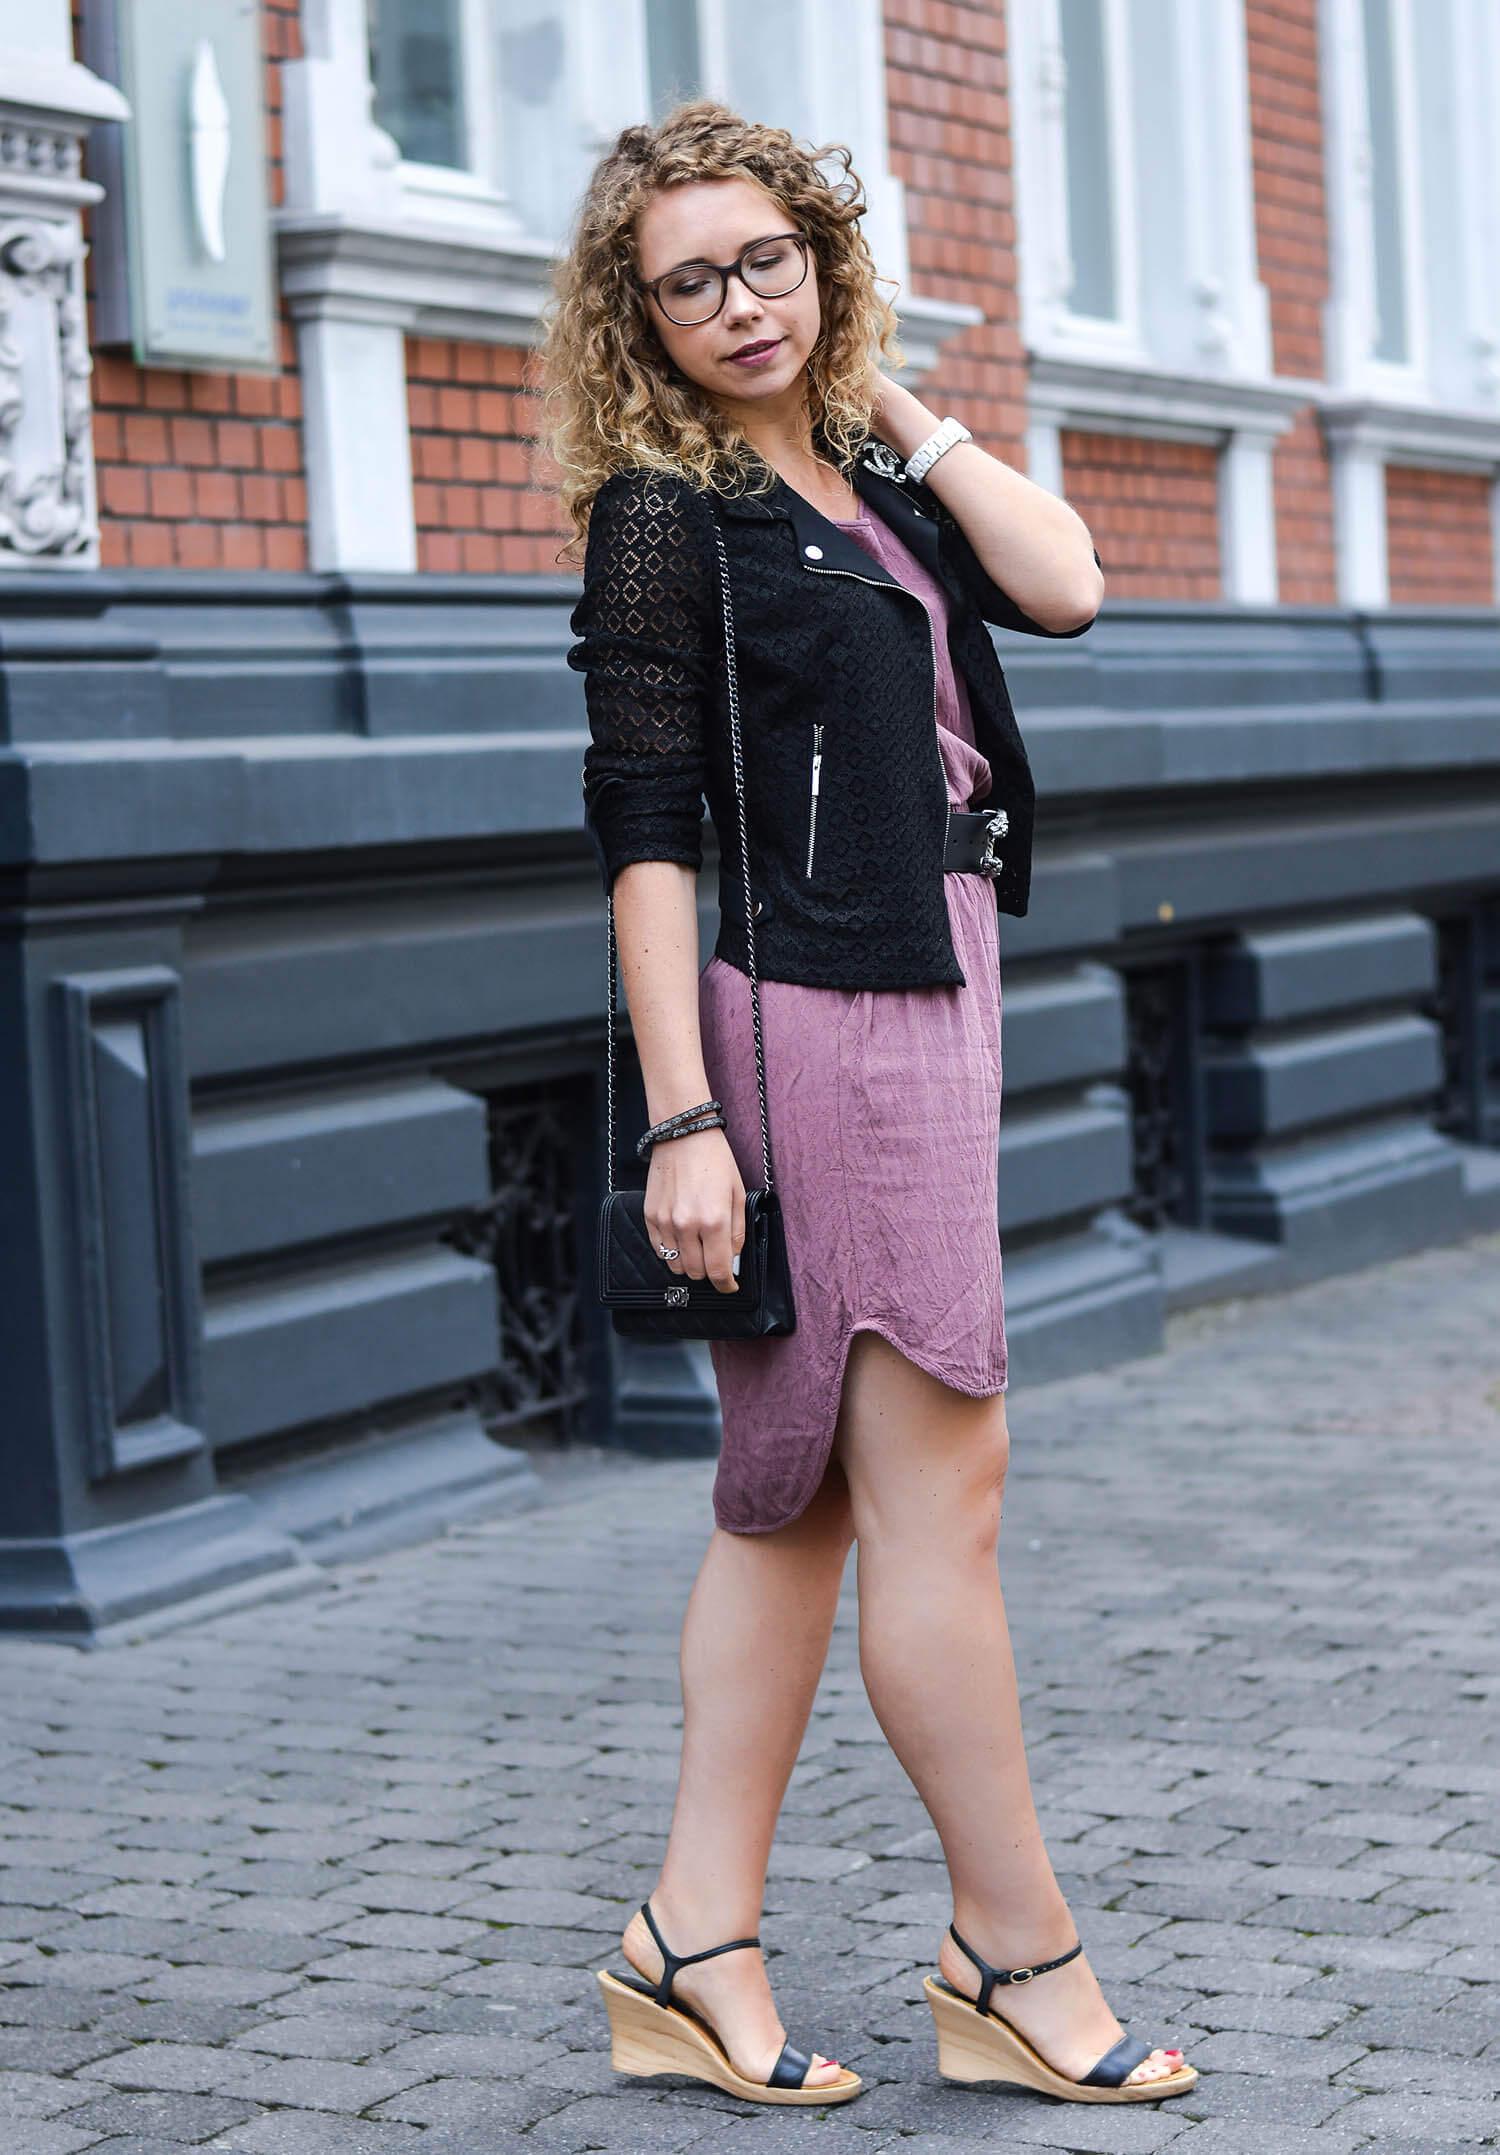 Kationette-fashionblog-nrw-Outfit-Pink-Dress-Gucci-Belt-Zara-Lace-Jacket